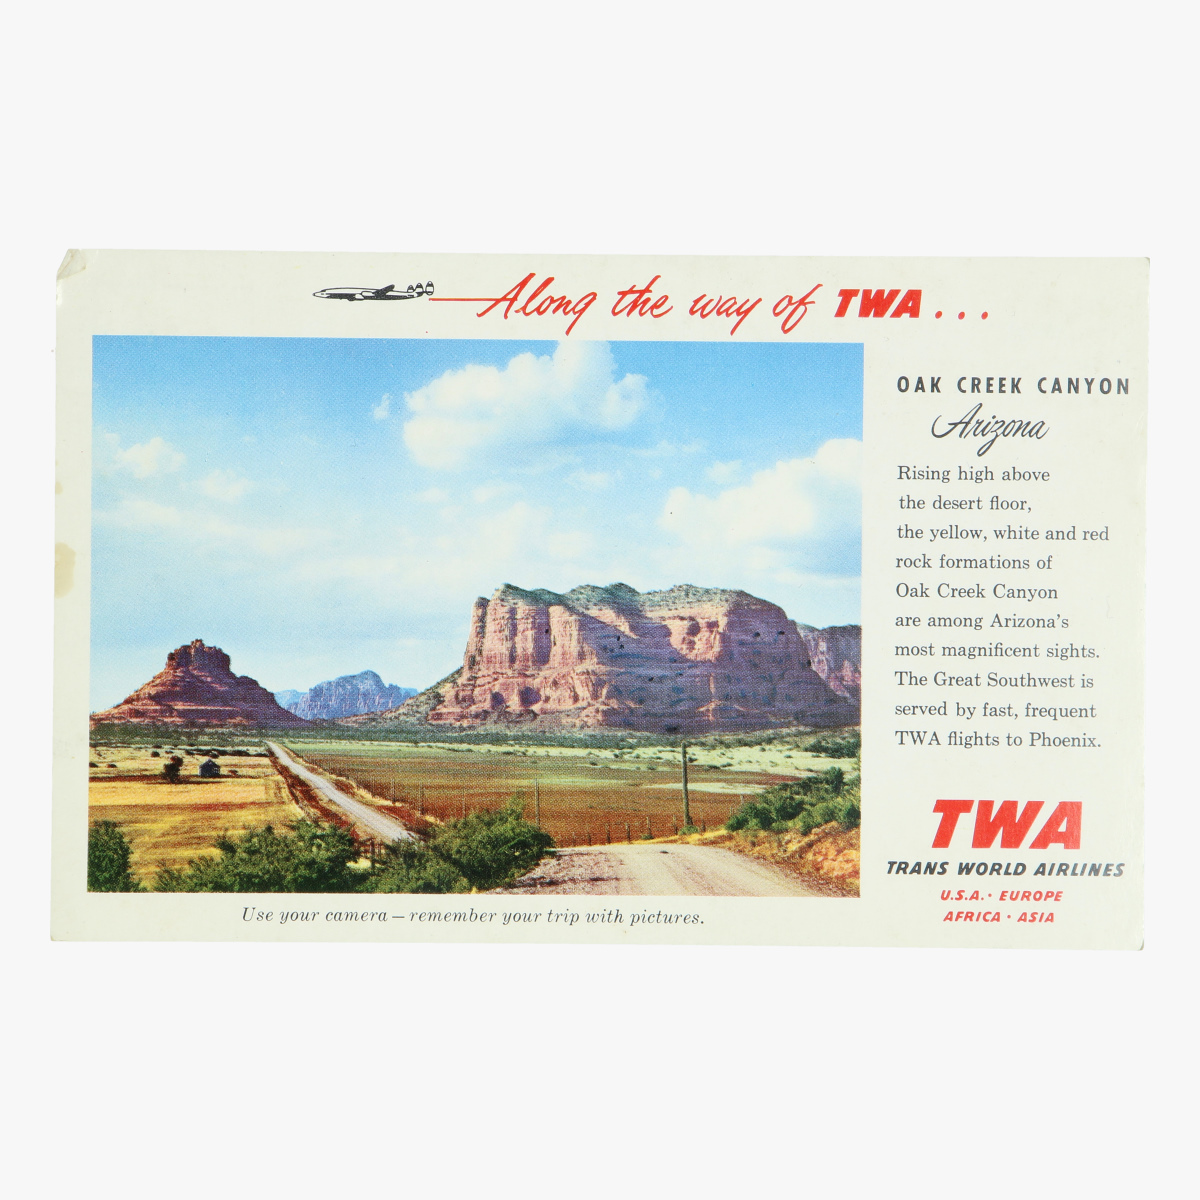 Afbeeldingen van postkaart along the way of twa.. Oak creek canyon arizona trans world airlines